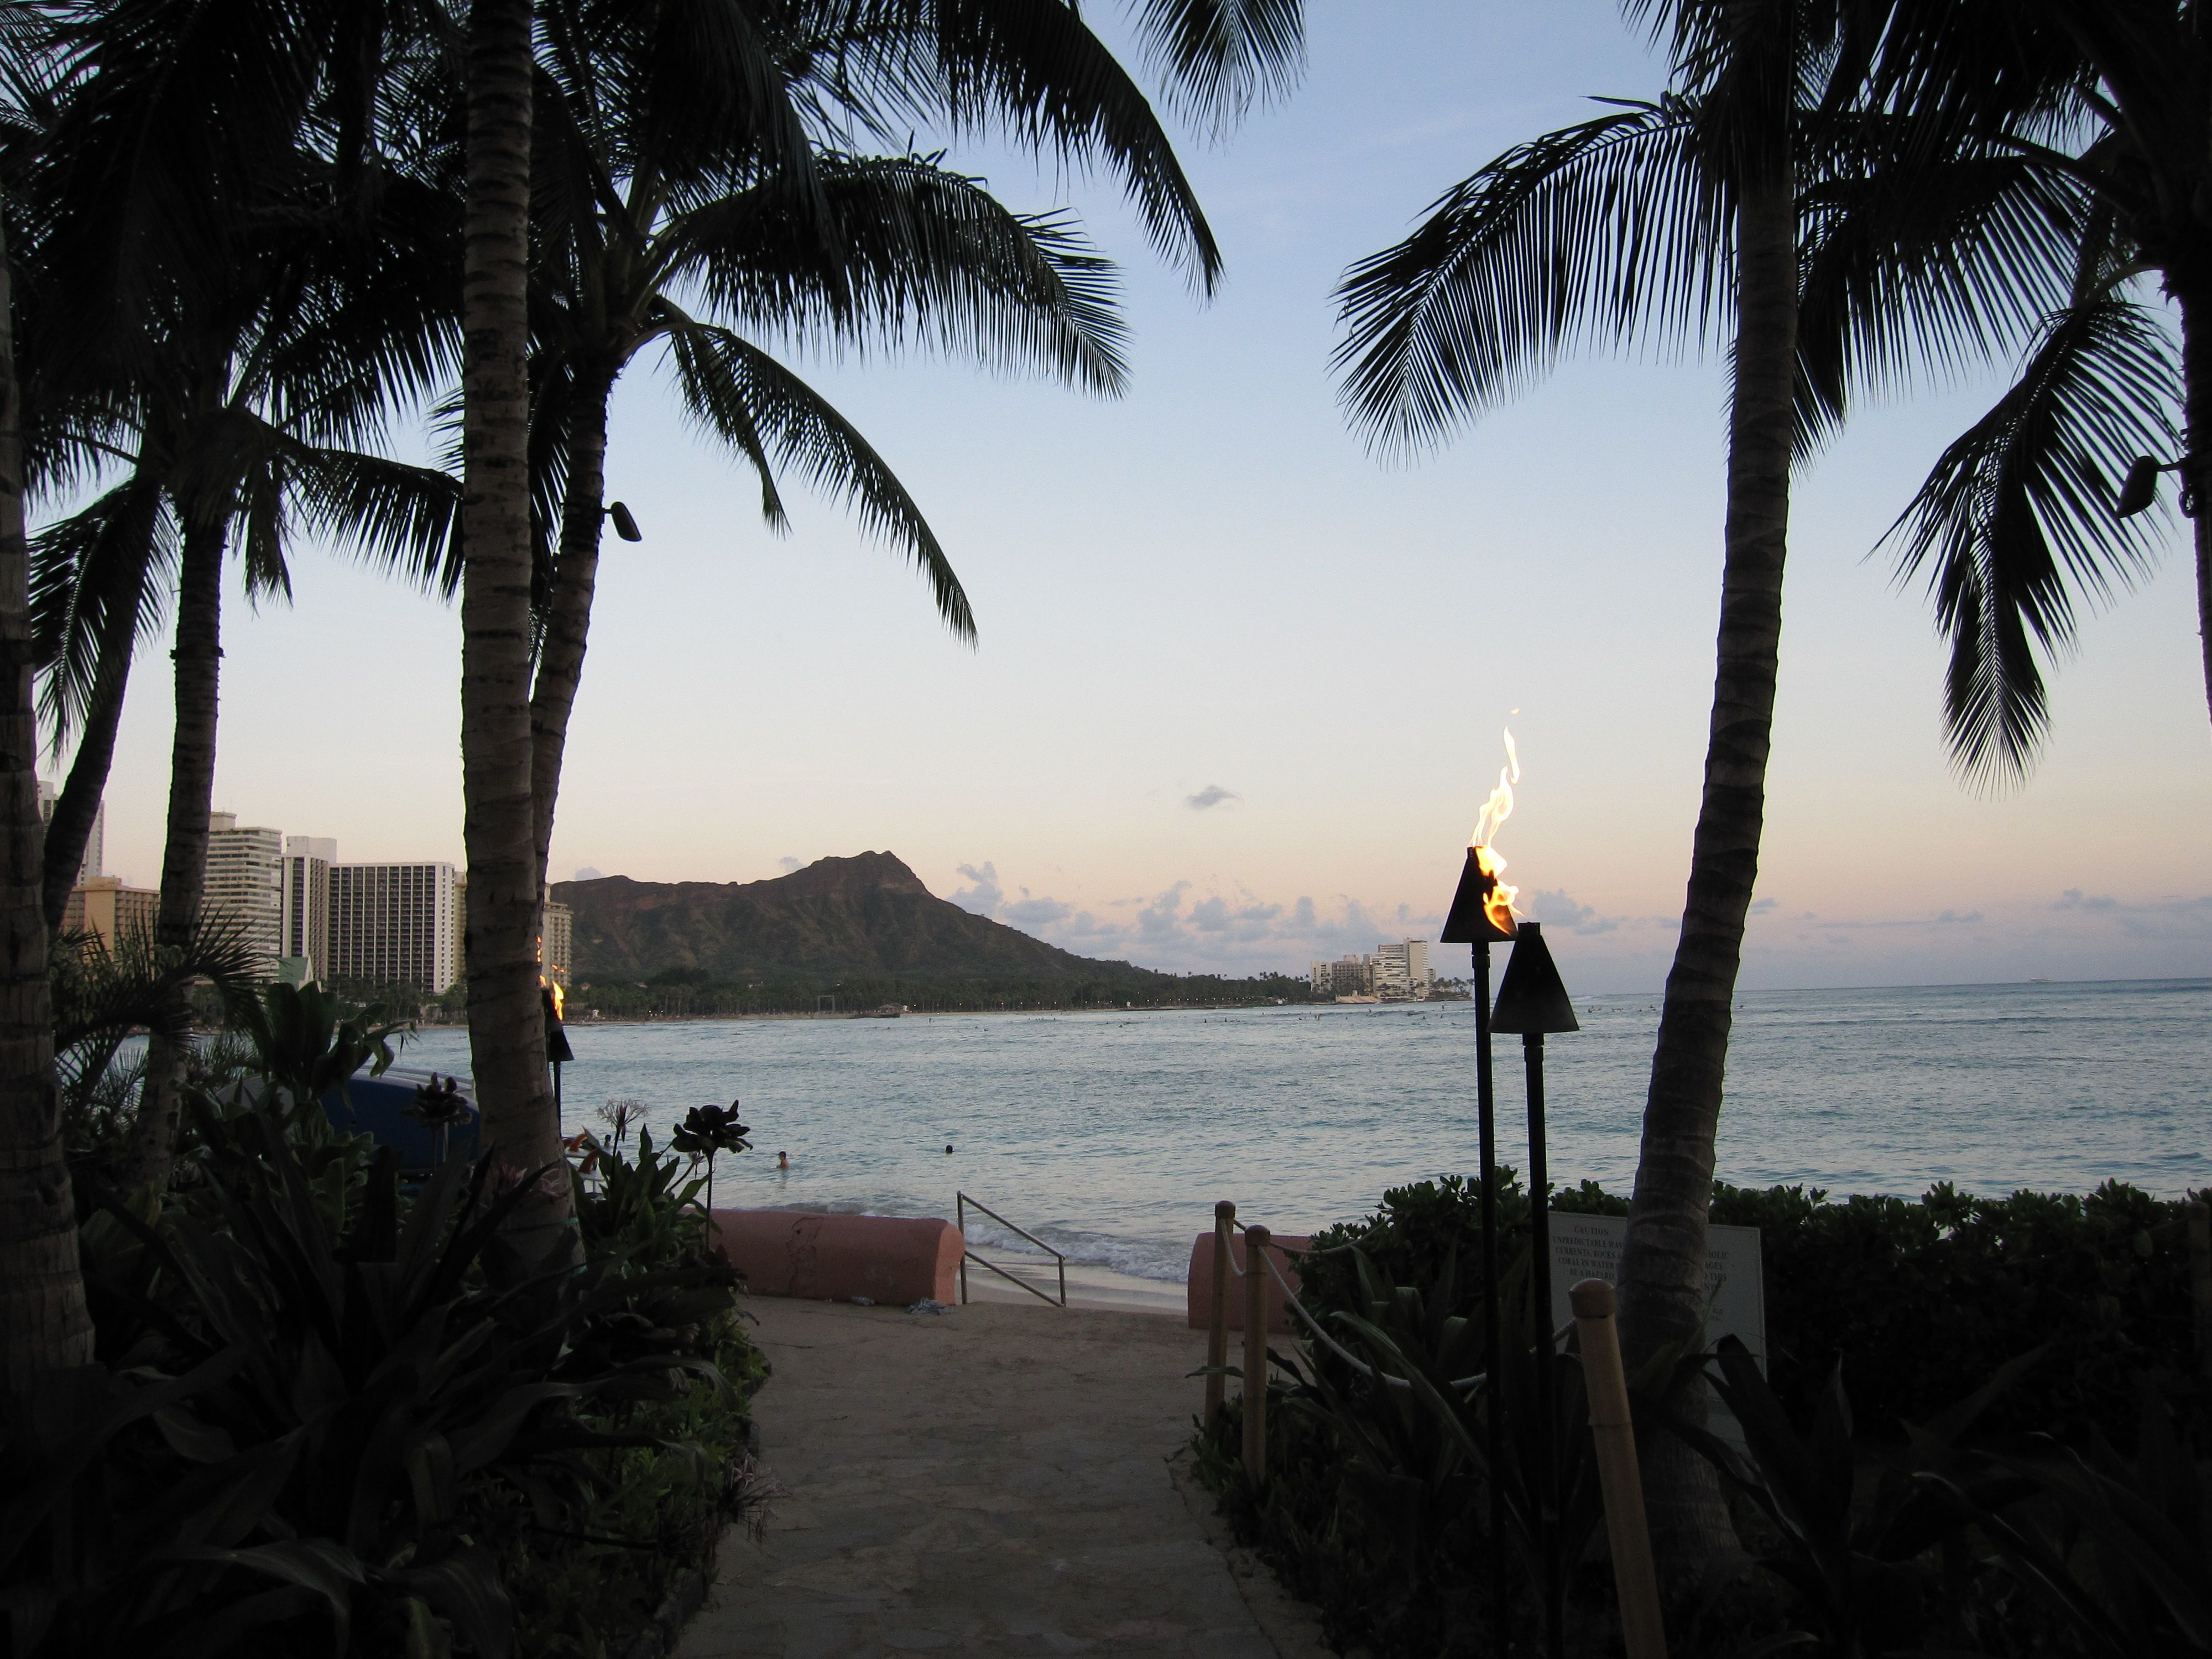 #Hawaii - #WaikikiBeach #DiamondHead